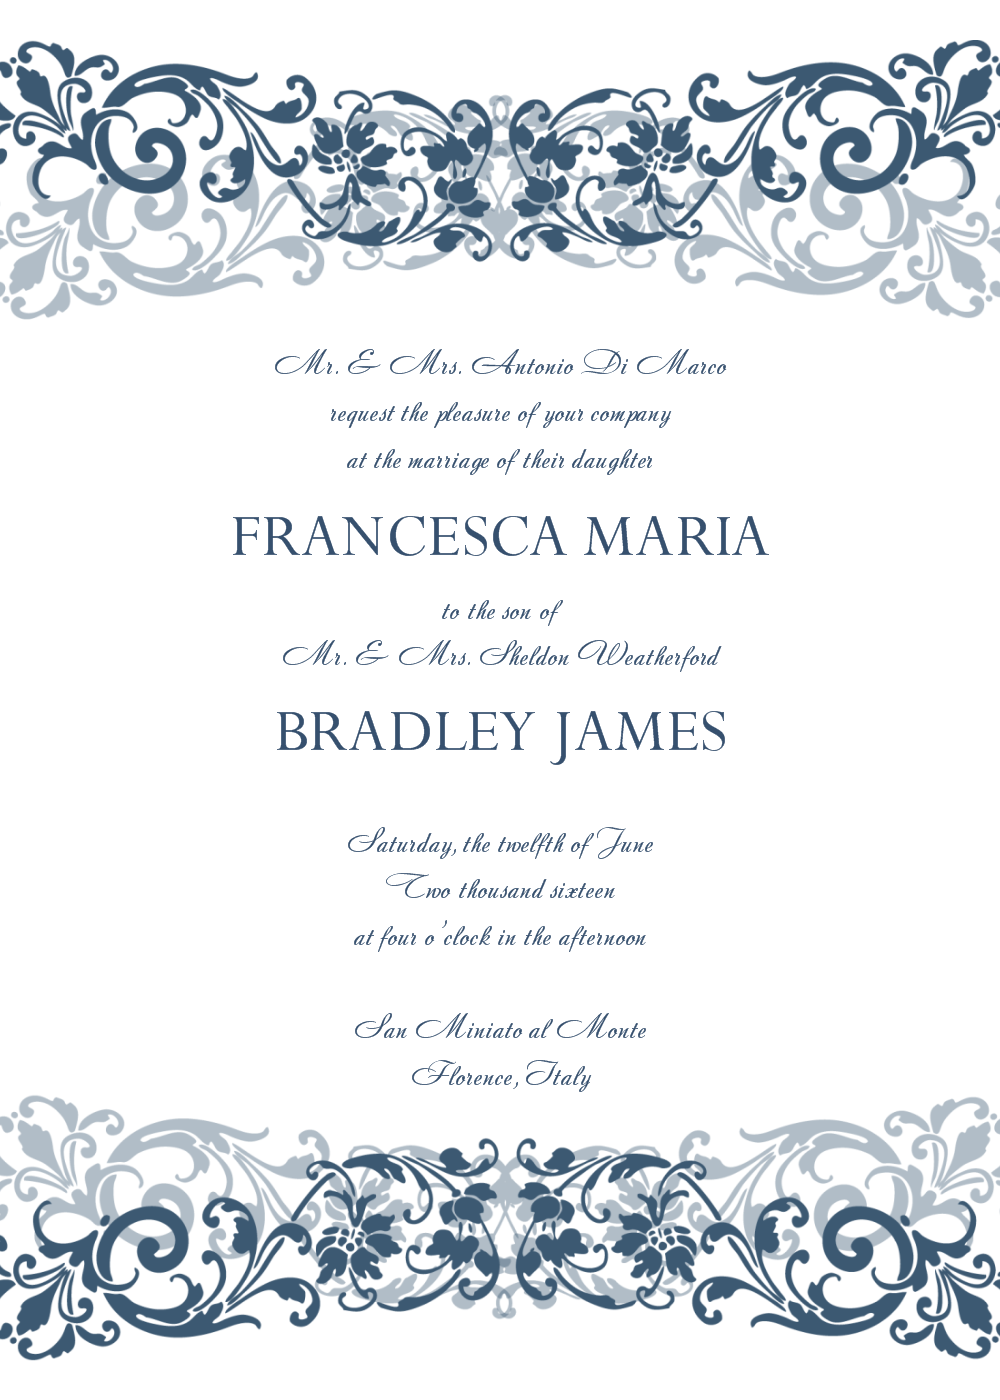 30+ Free Wedding Invitations Templates 21st Bridal